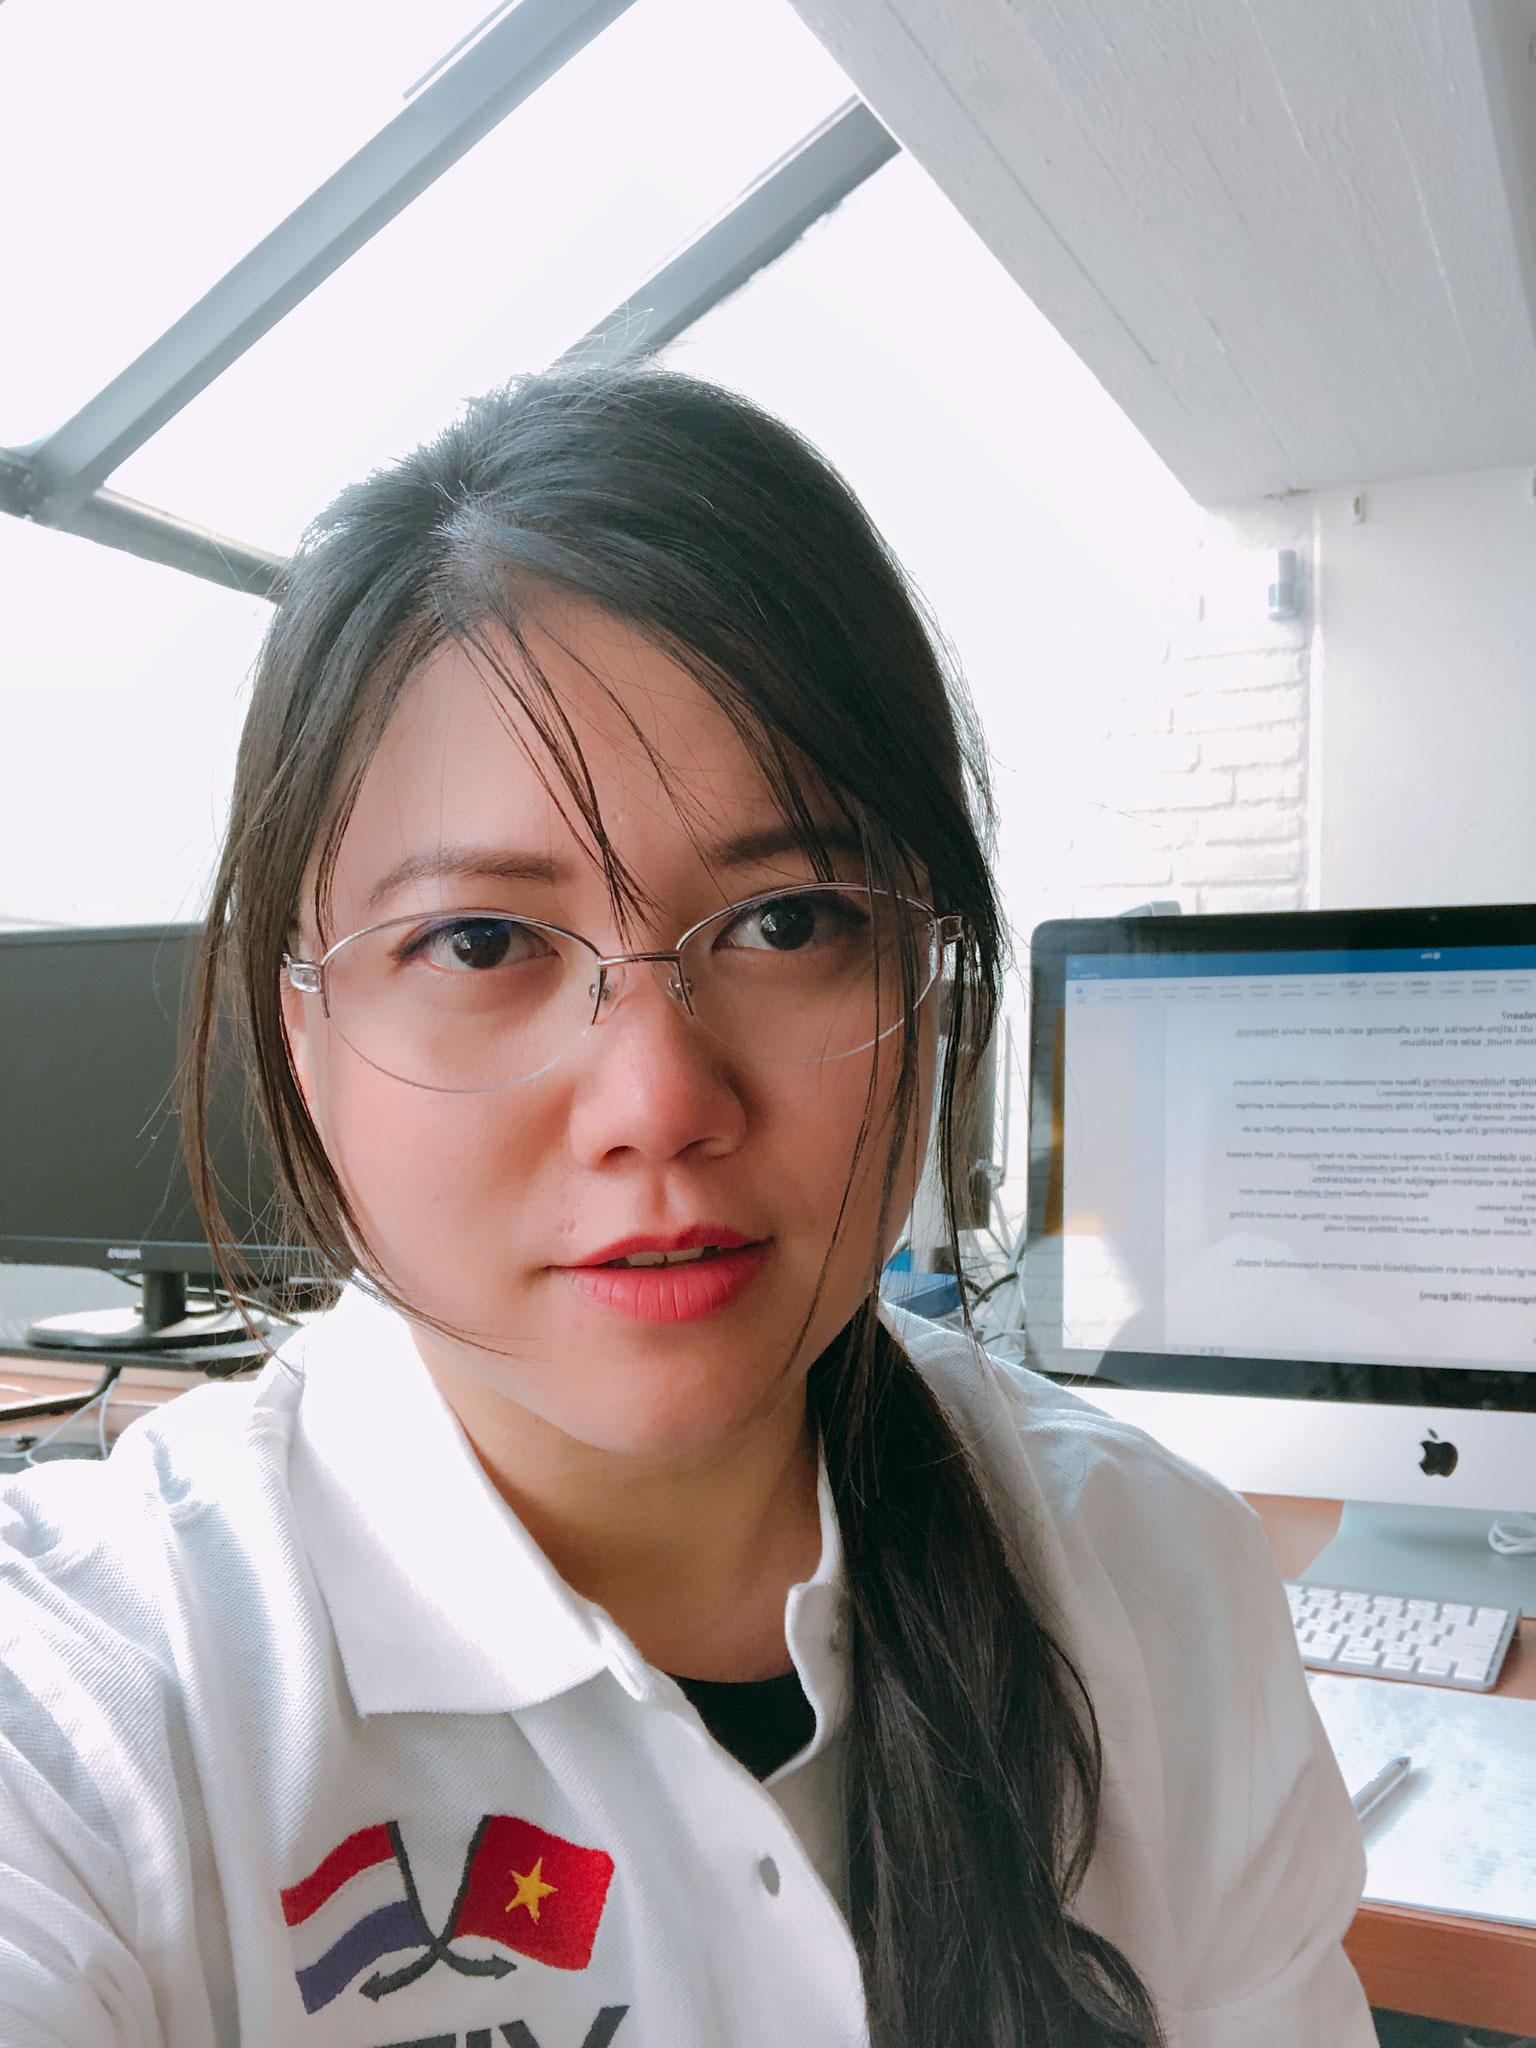 Mrs. Vivian Nguyen 🙎🏻♀Export / Import  🇬🇧English & 🇻🇳Tiếng Việt & 🇳🇱Nederlands   ☎+31 (0) 6 1876 5375   📩Import@viec.nl